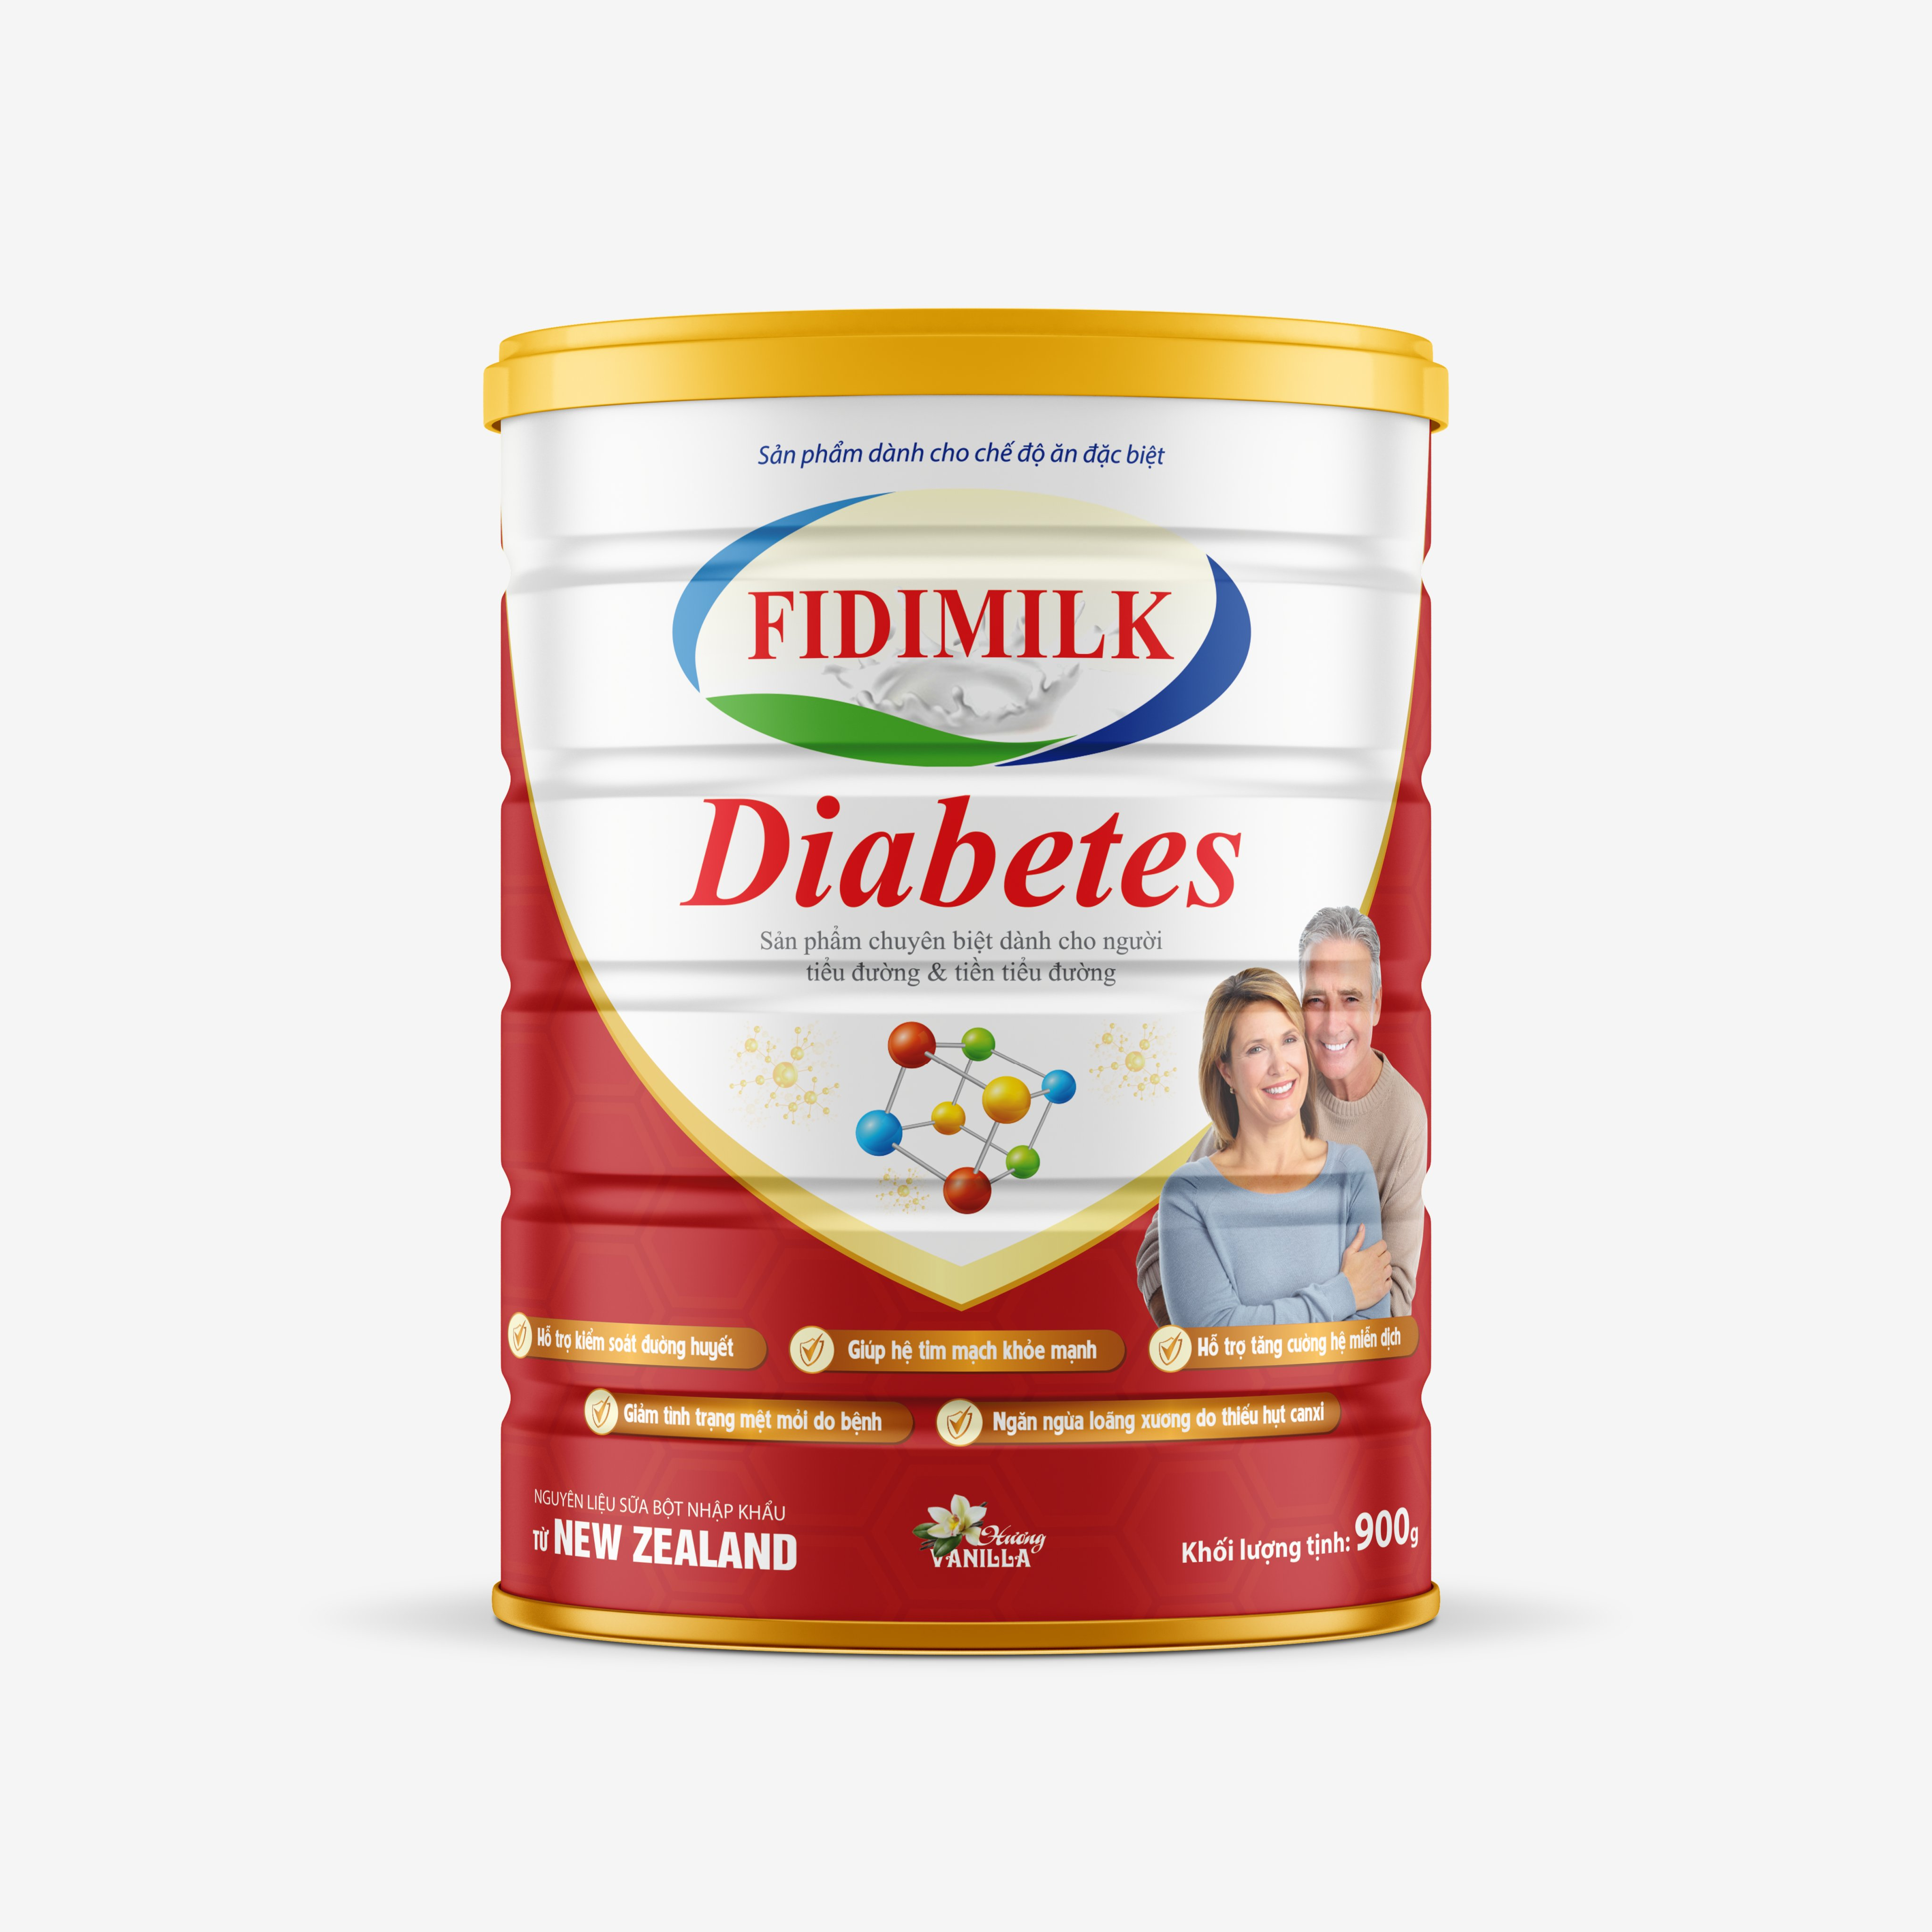 SỮA BỘT FIDIMILK DIABETES